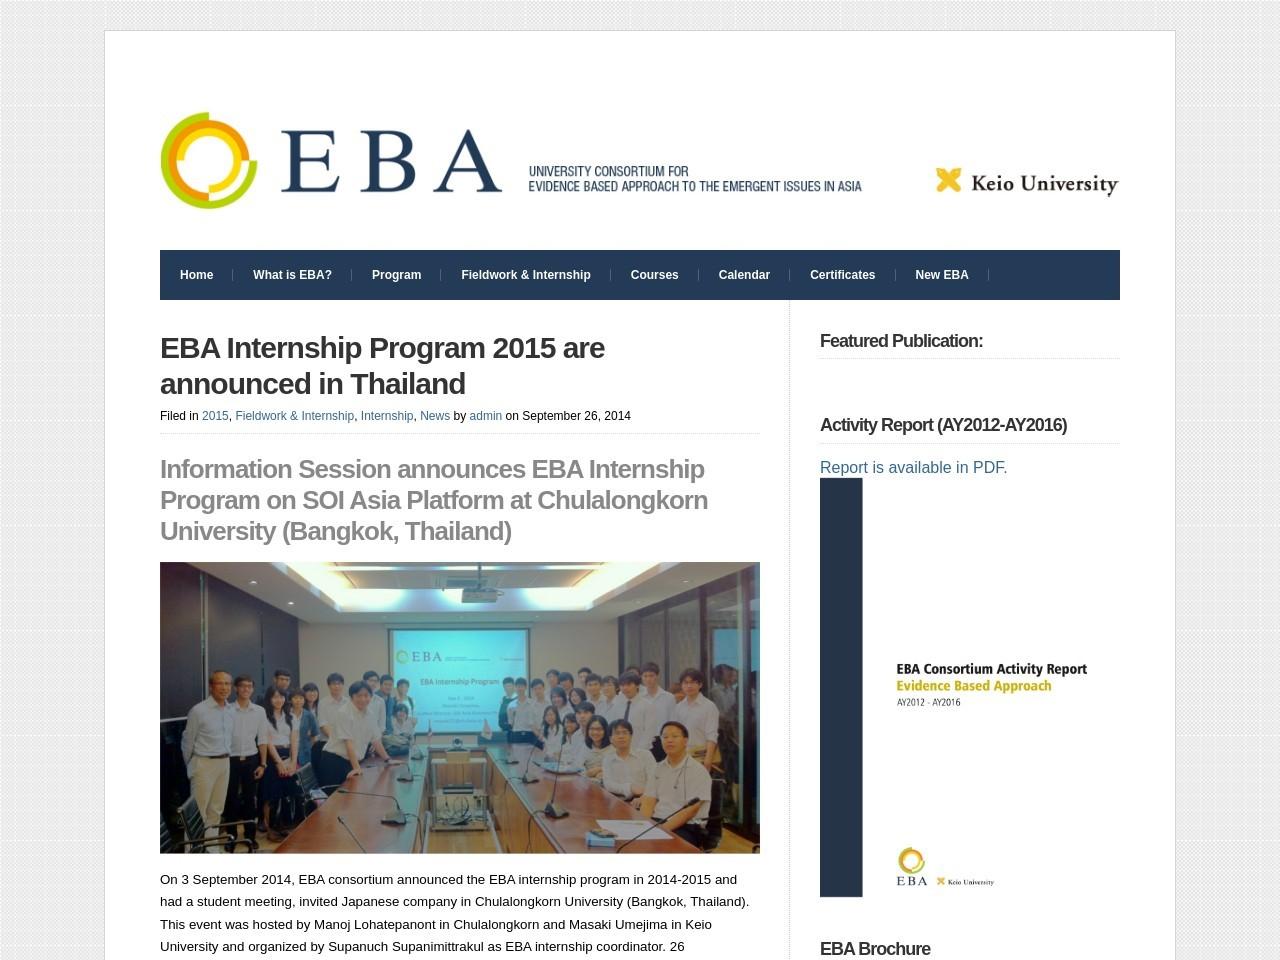 EBA Internship Program 2015 are announced in Thailand …